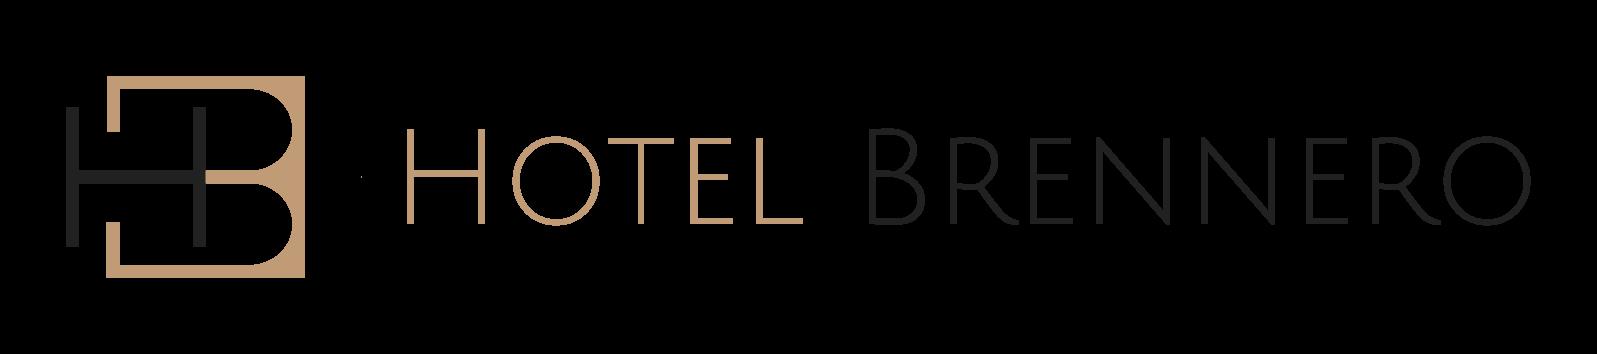 Hotel Brennero logo